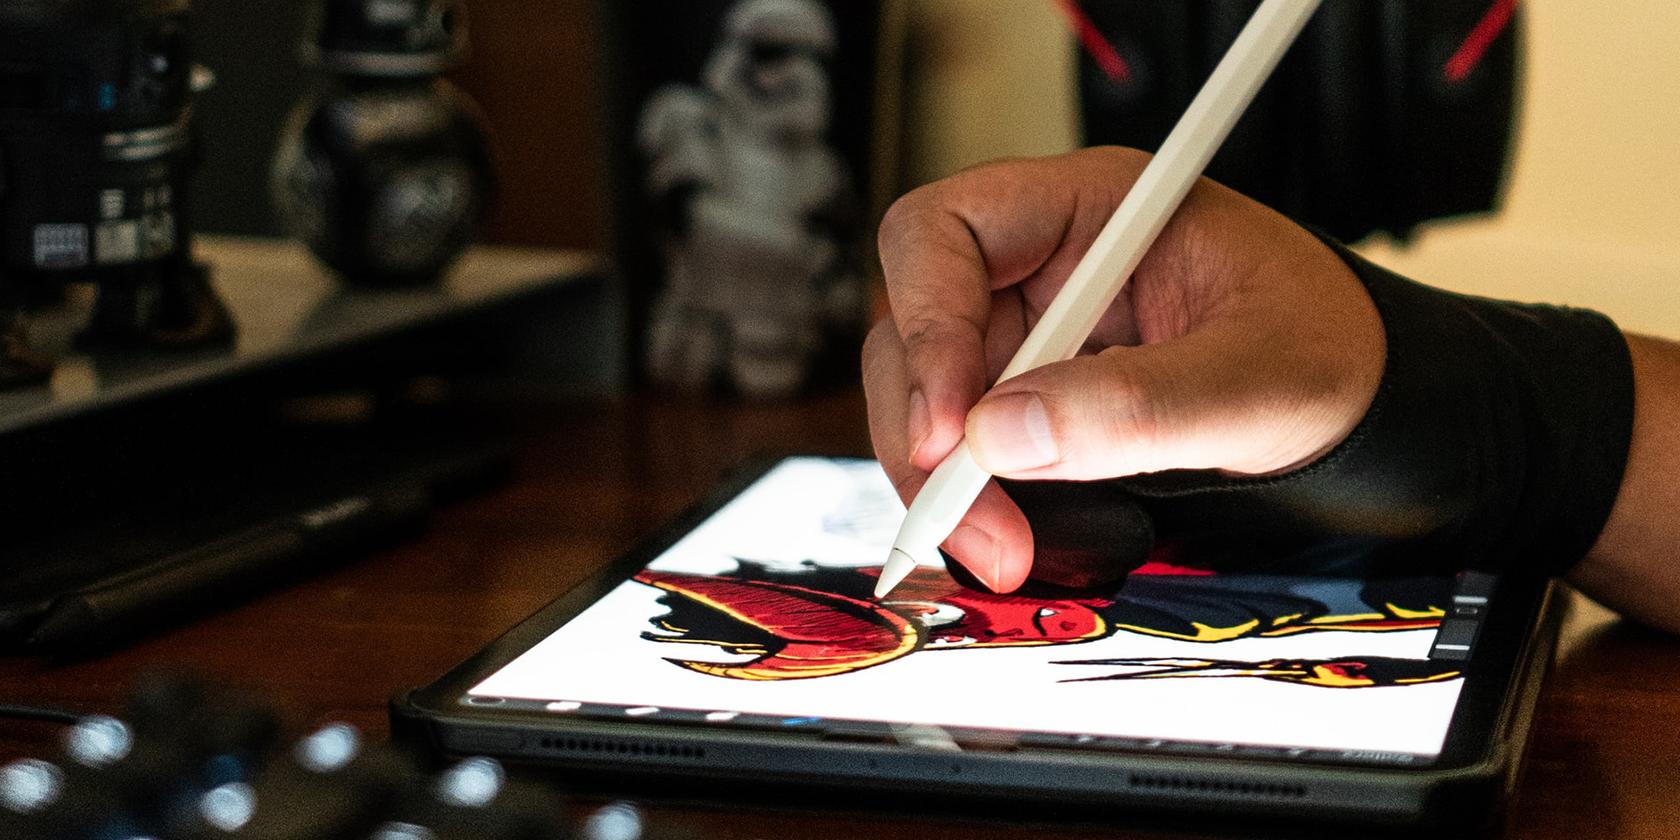 The 6 Best Platforms for Sharing Your Digital Art Online